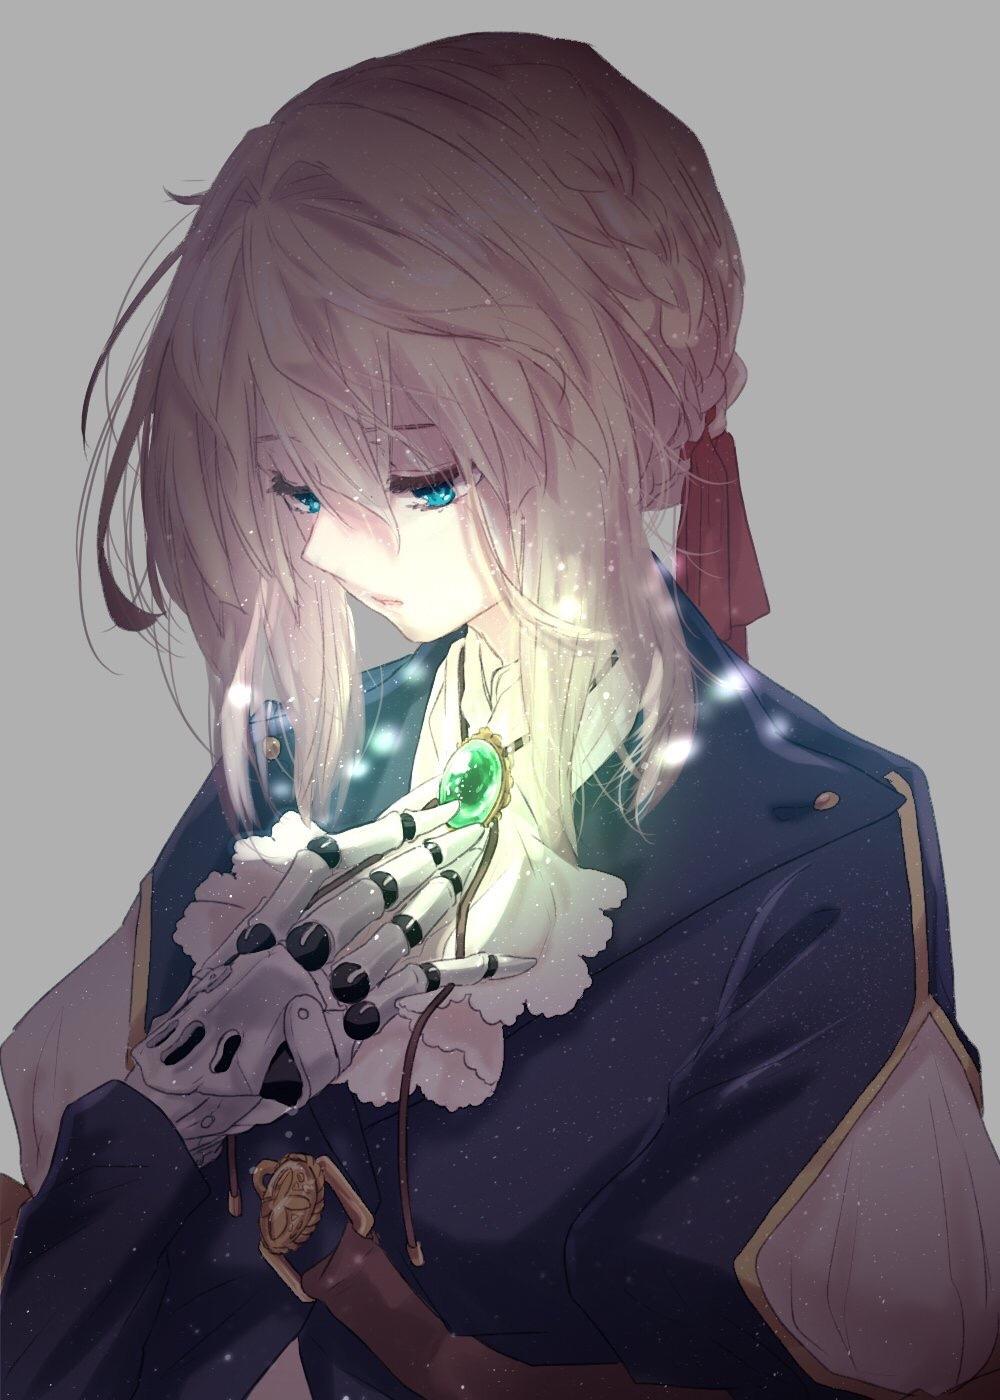 【P站美图】紫罗兰永恒花园壁纸特辑